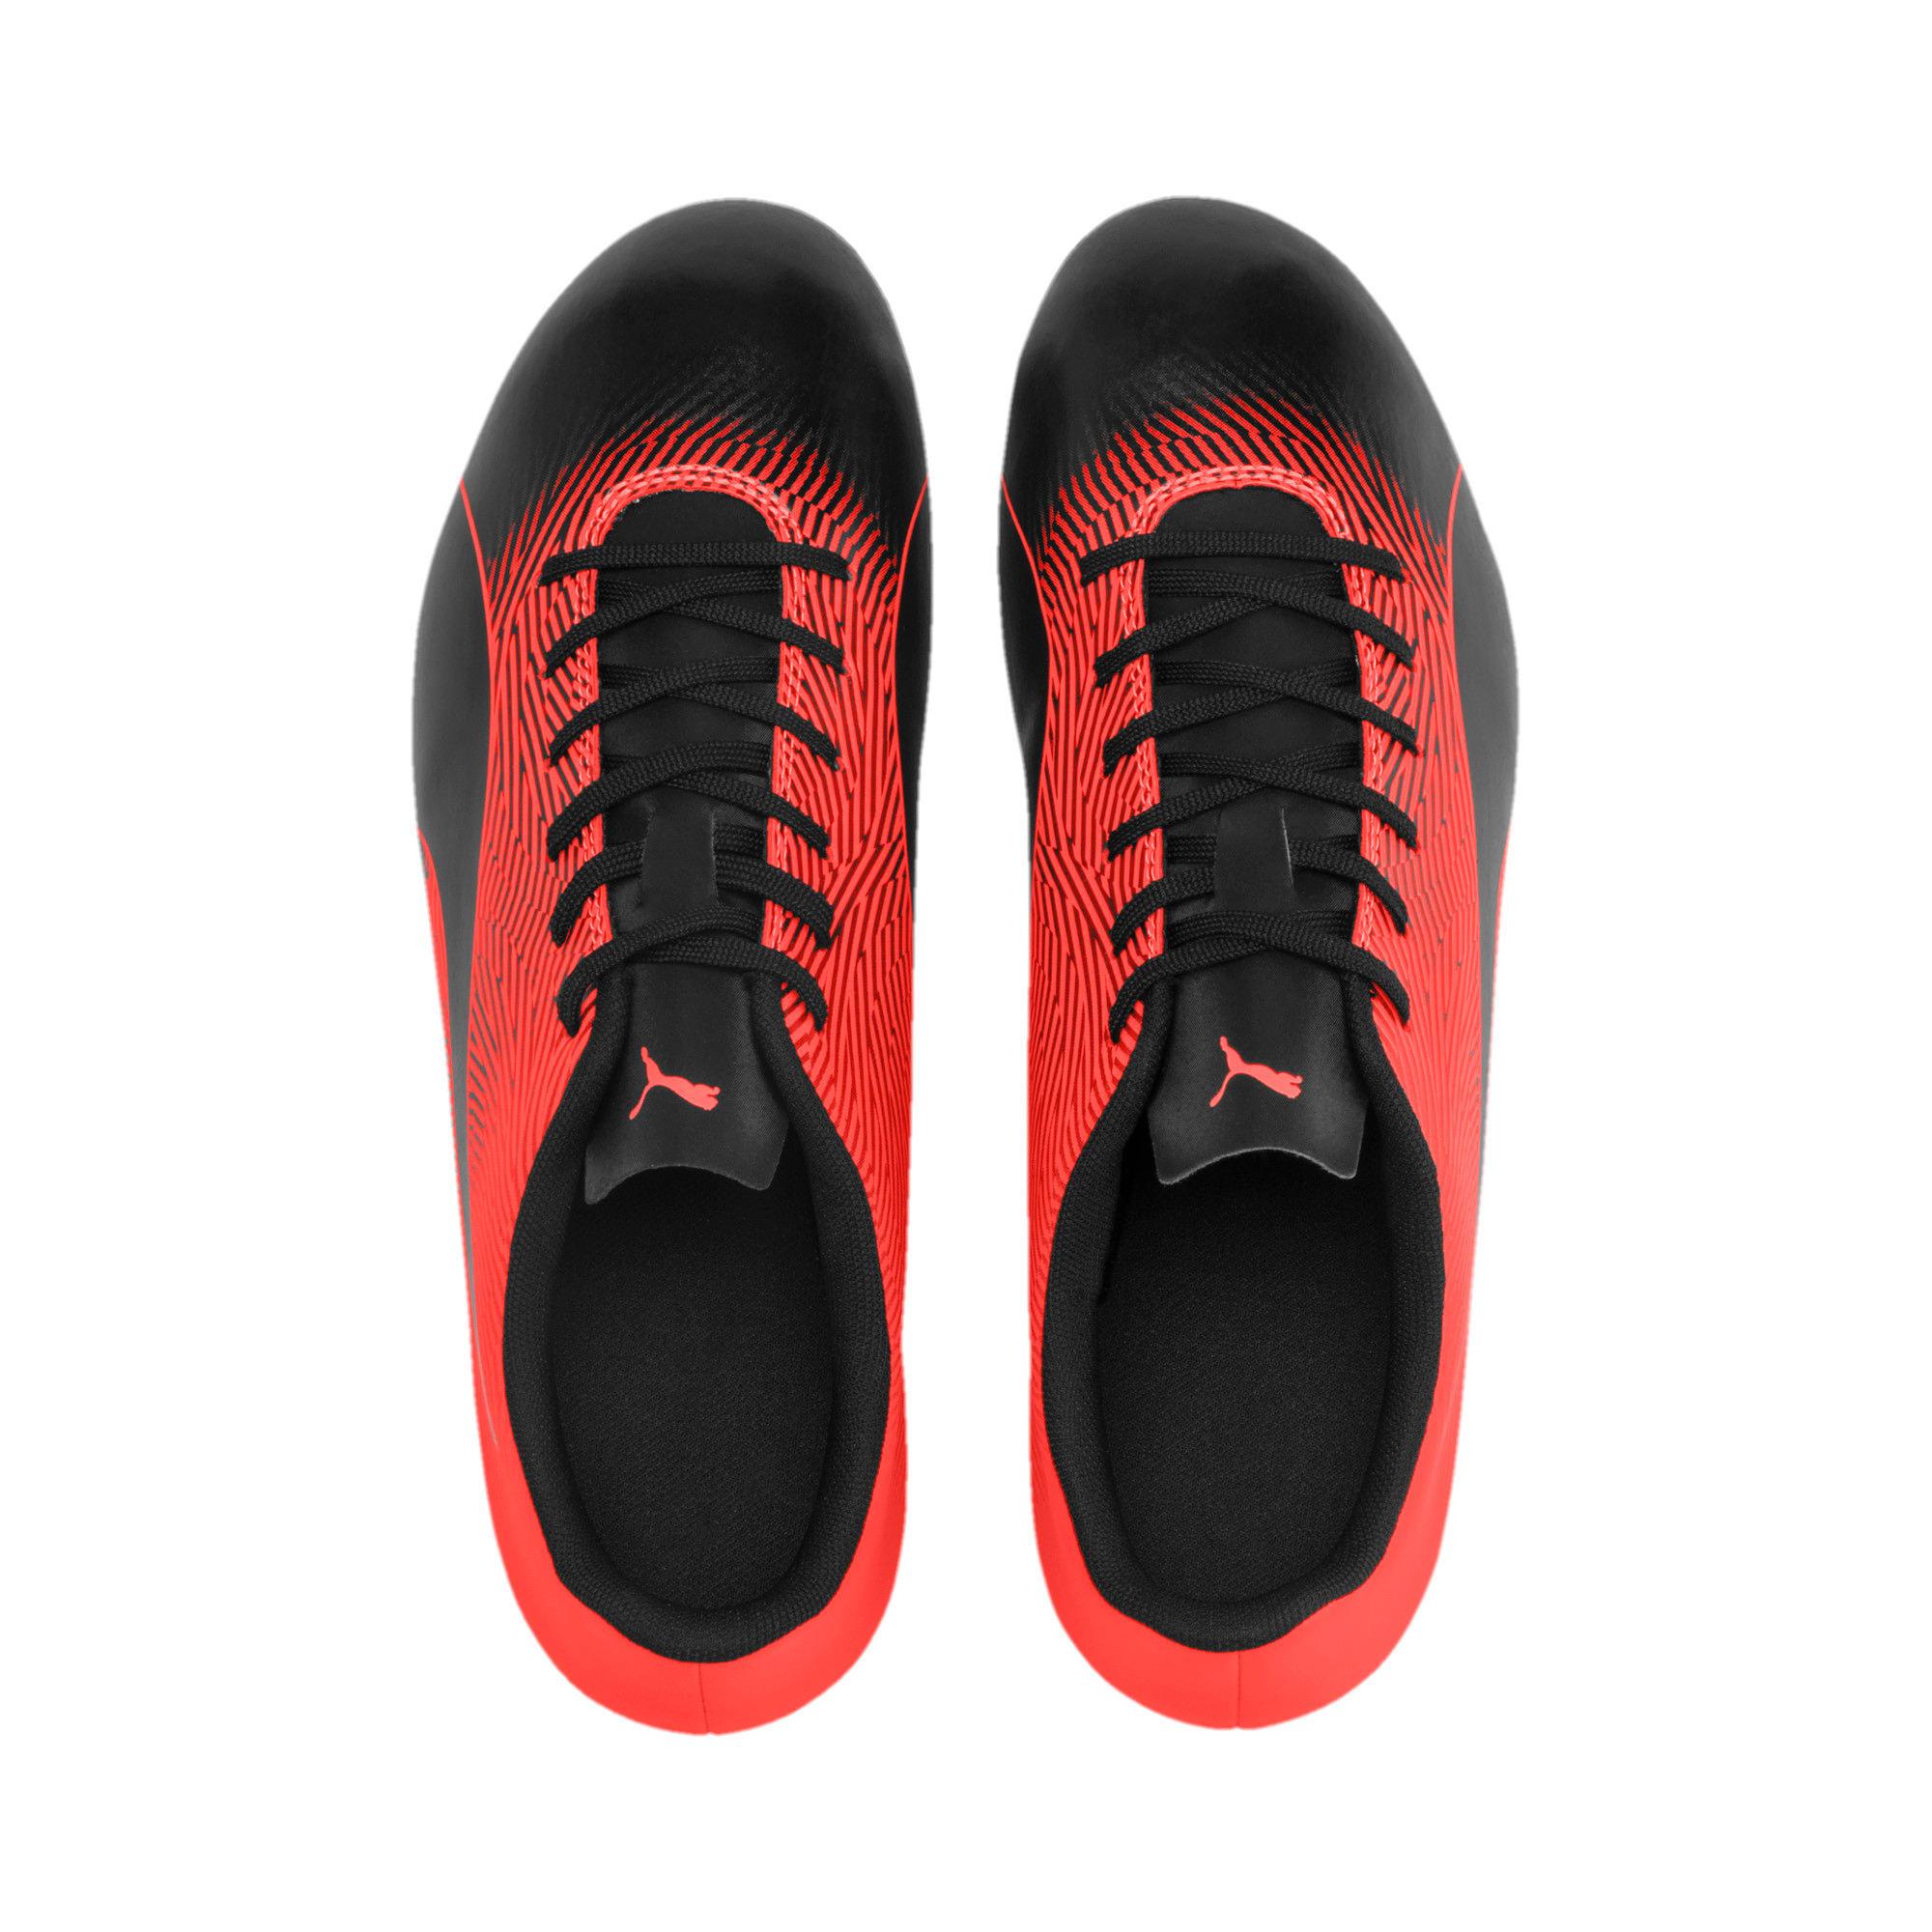 Thumbnail 8 of PUMA Spirit II FG Men's Football Boots, Puma Black-Nrgy Red, medium-IND